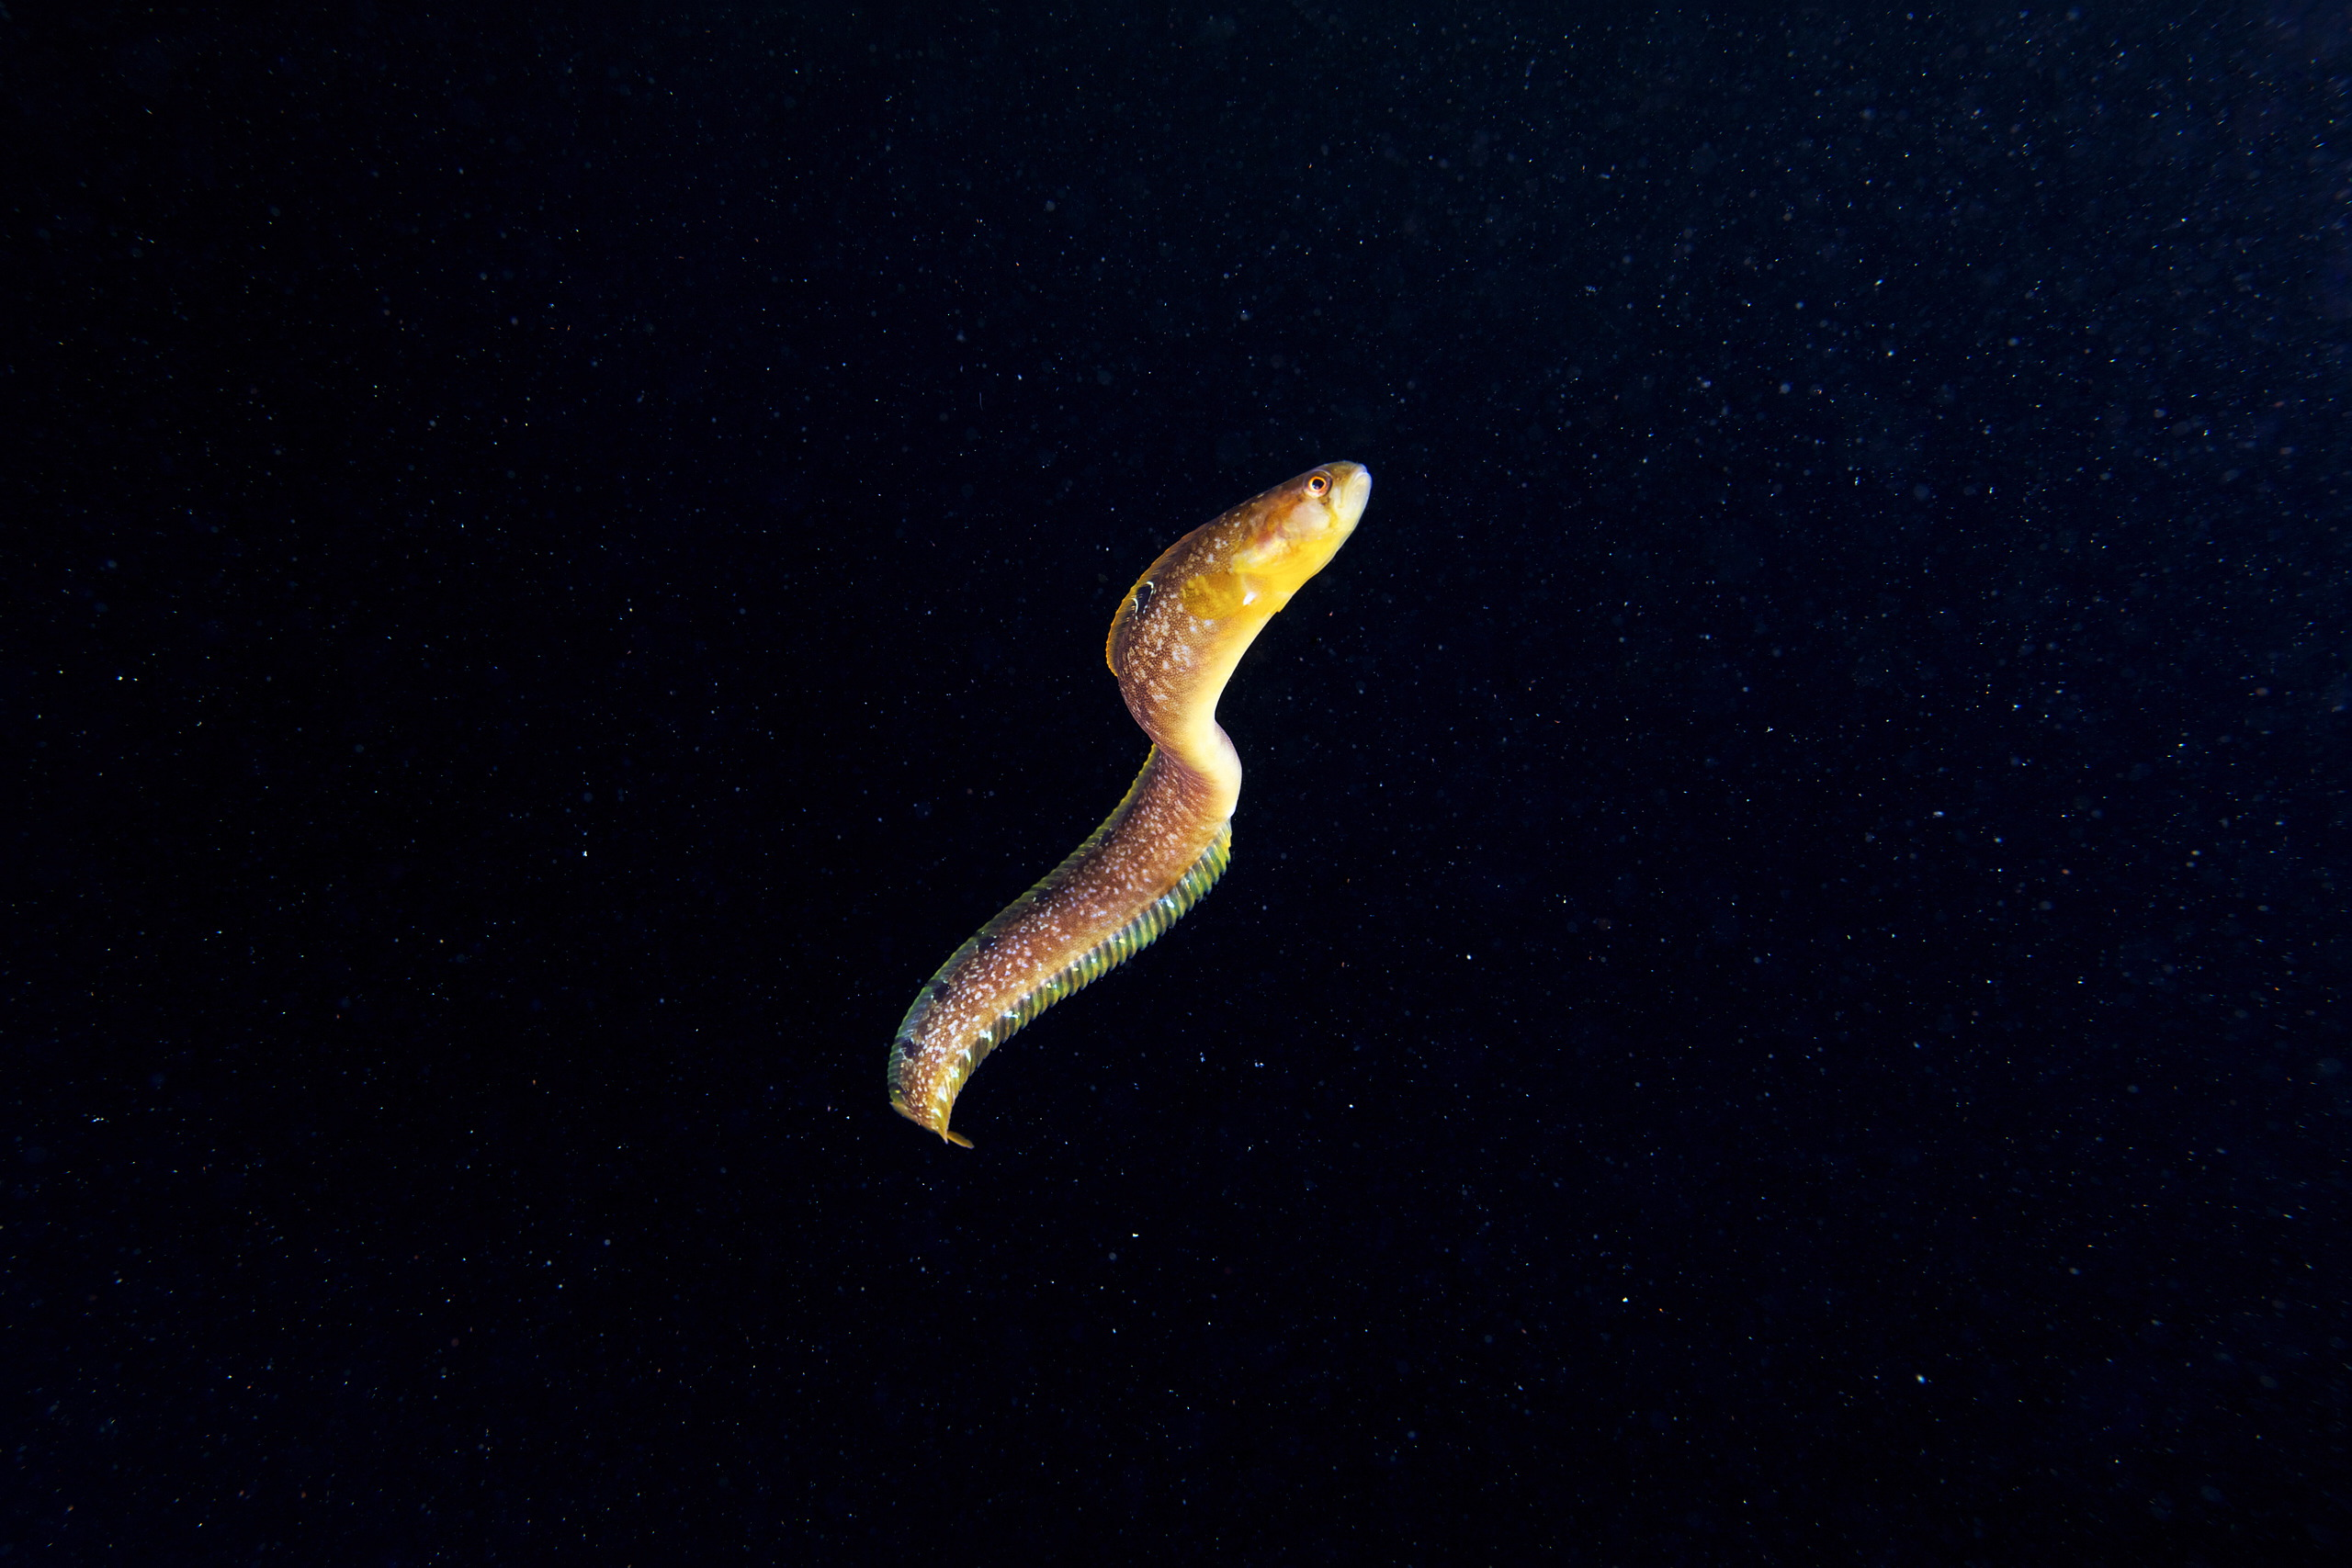 Fish – Pholis gunnellus